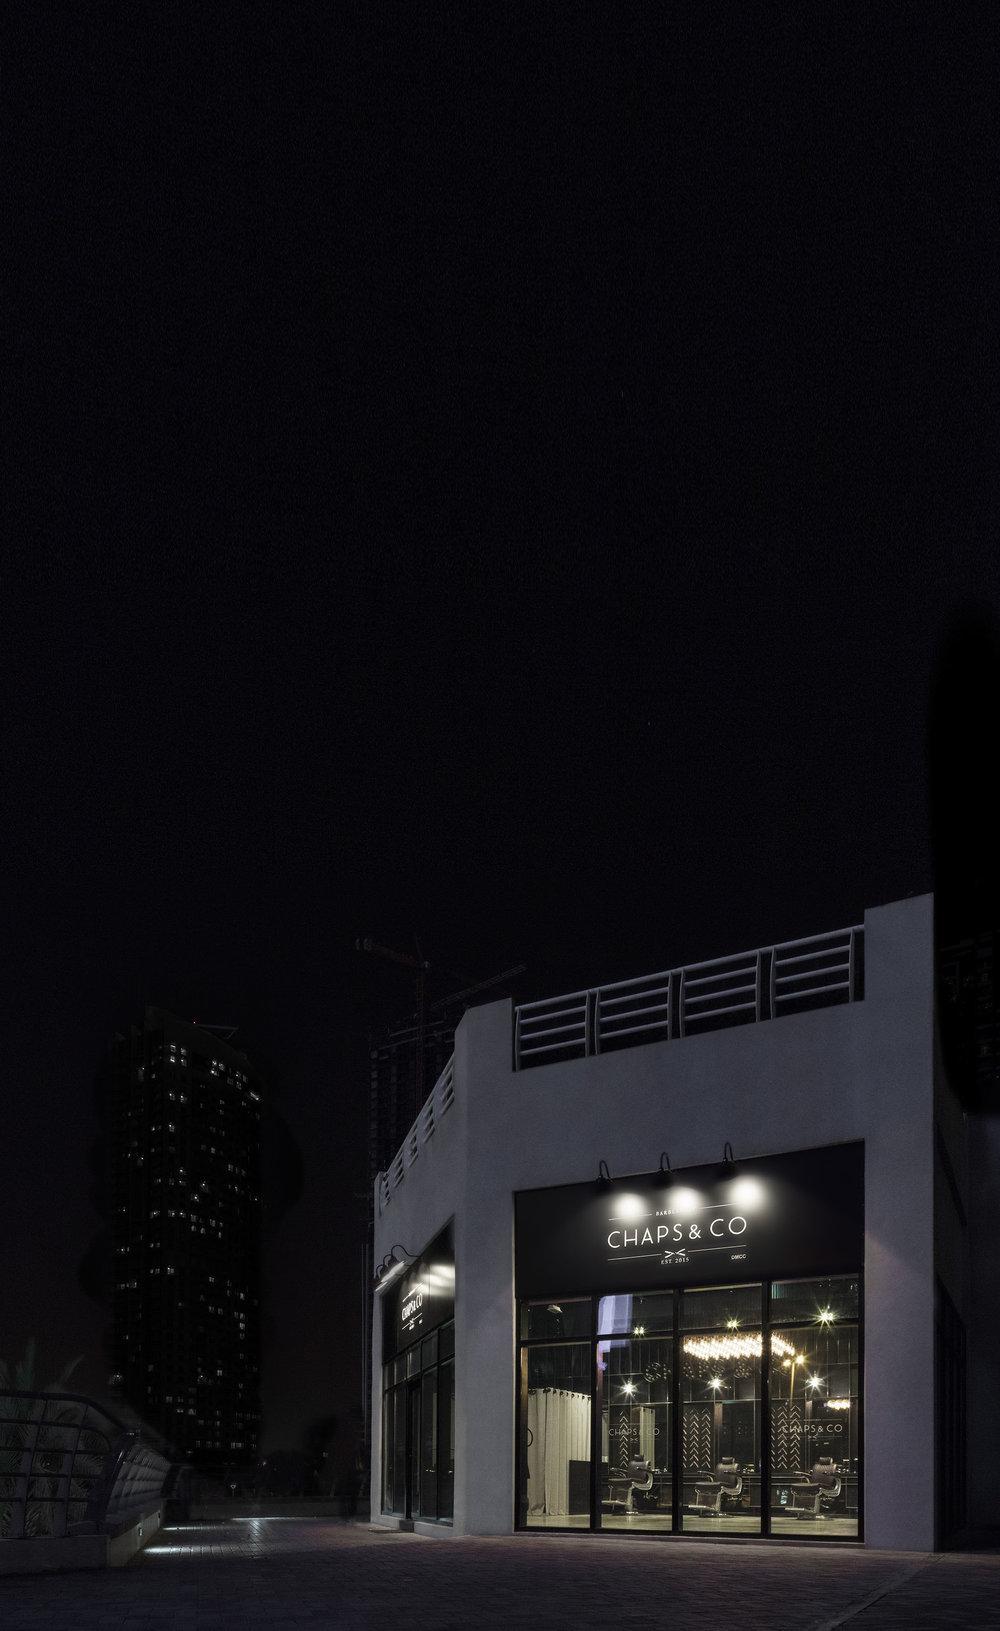 Chaps & Co-JLT-Dubai-Barbershop-Facade-Interior-Design-Architect.jpg